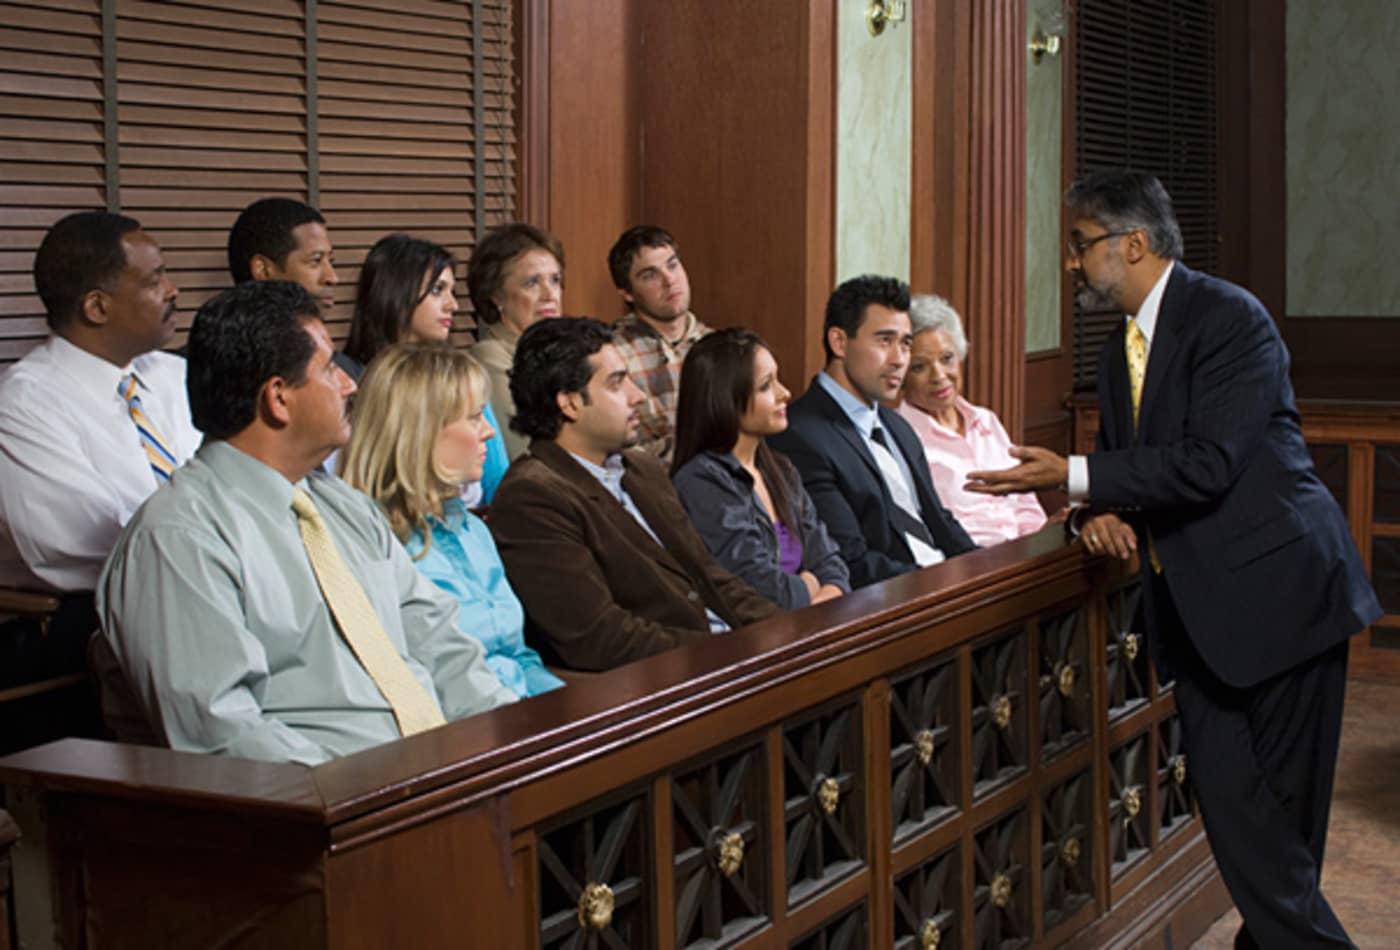 CNBC_americas_highest_paying_jobs_lawyer.jpg